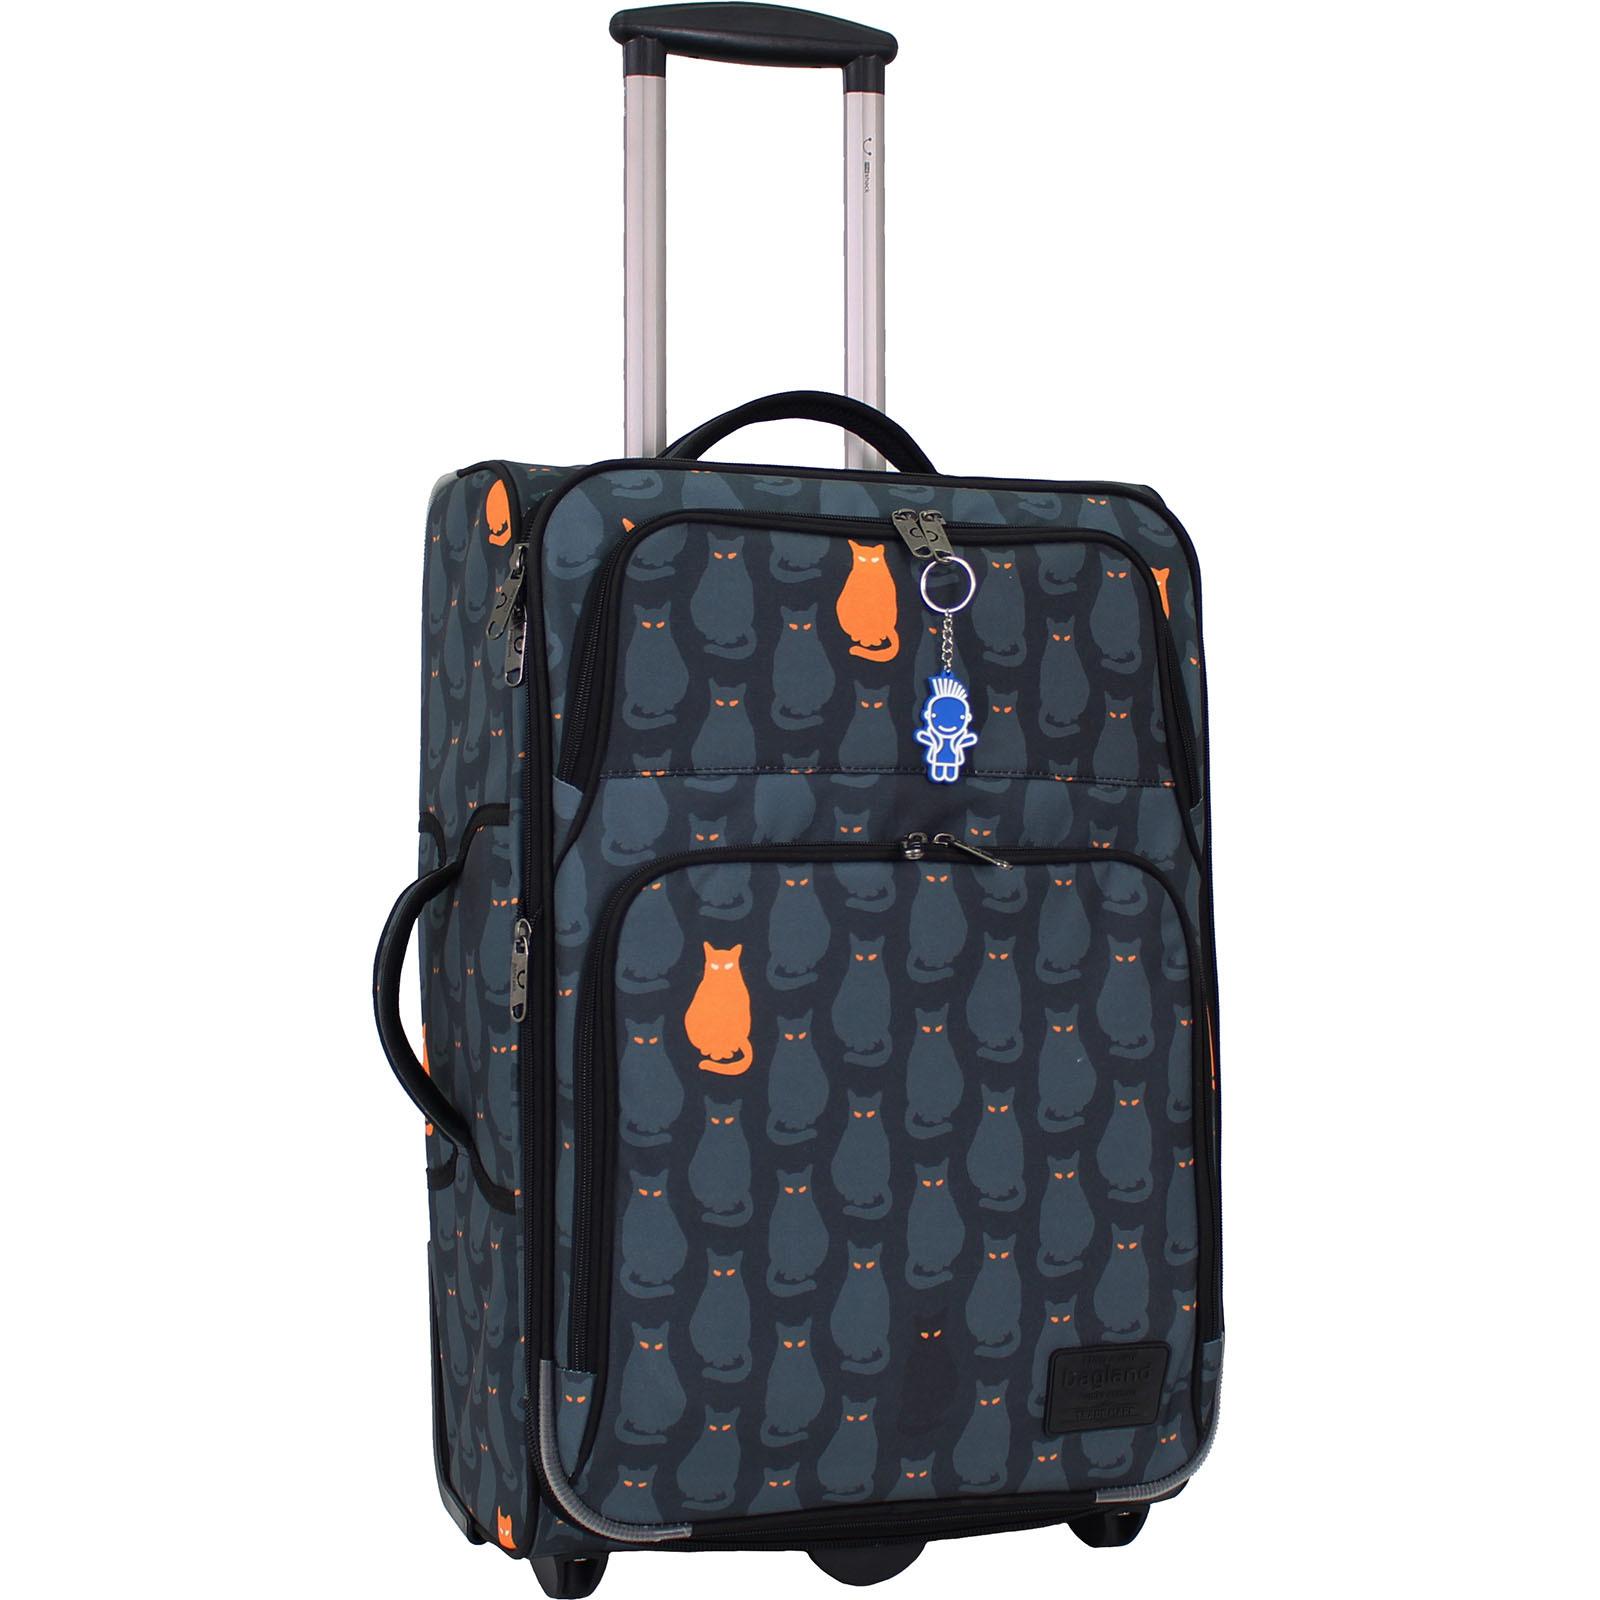 Дорожные чемоданы Чемодан Bagland Леон средний дизайн 51 л. сублімація 193 (0037666244) IMG_1721.JPG